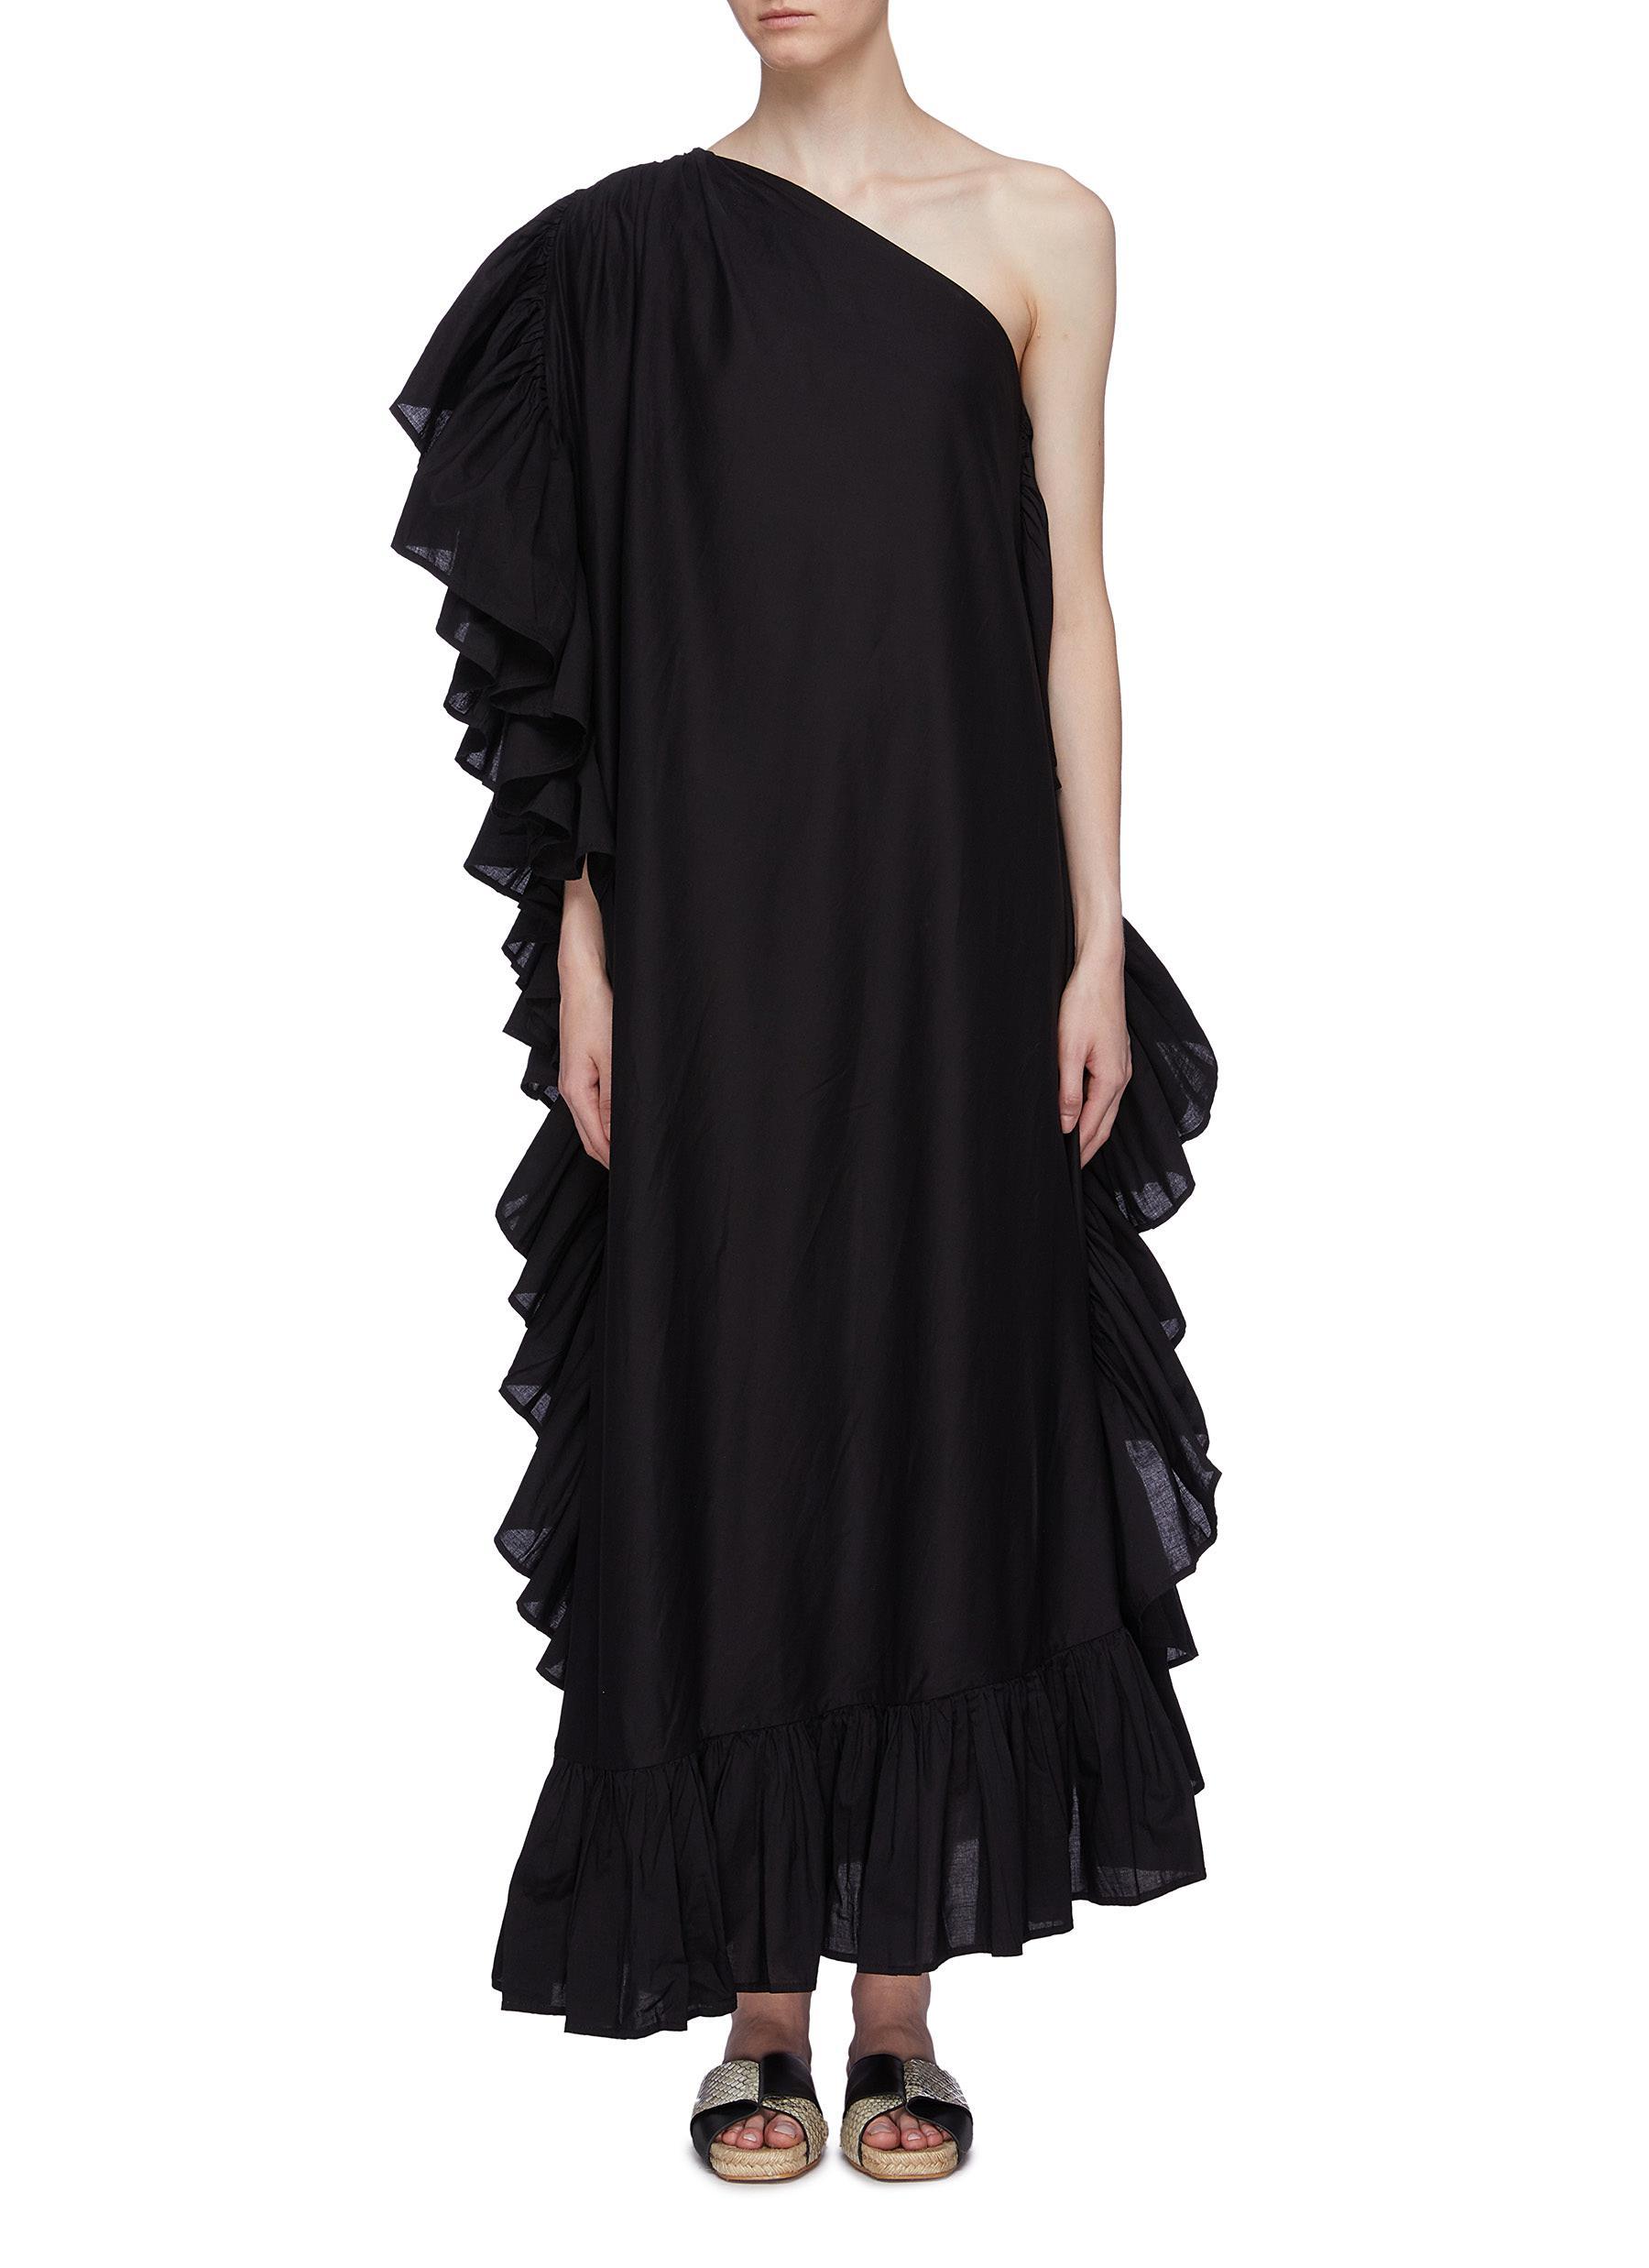 Zahara ruffle one-shoulder maxi dress by Kalita